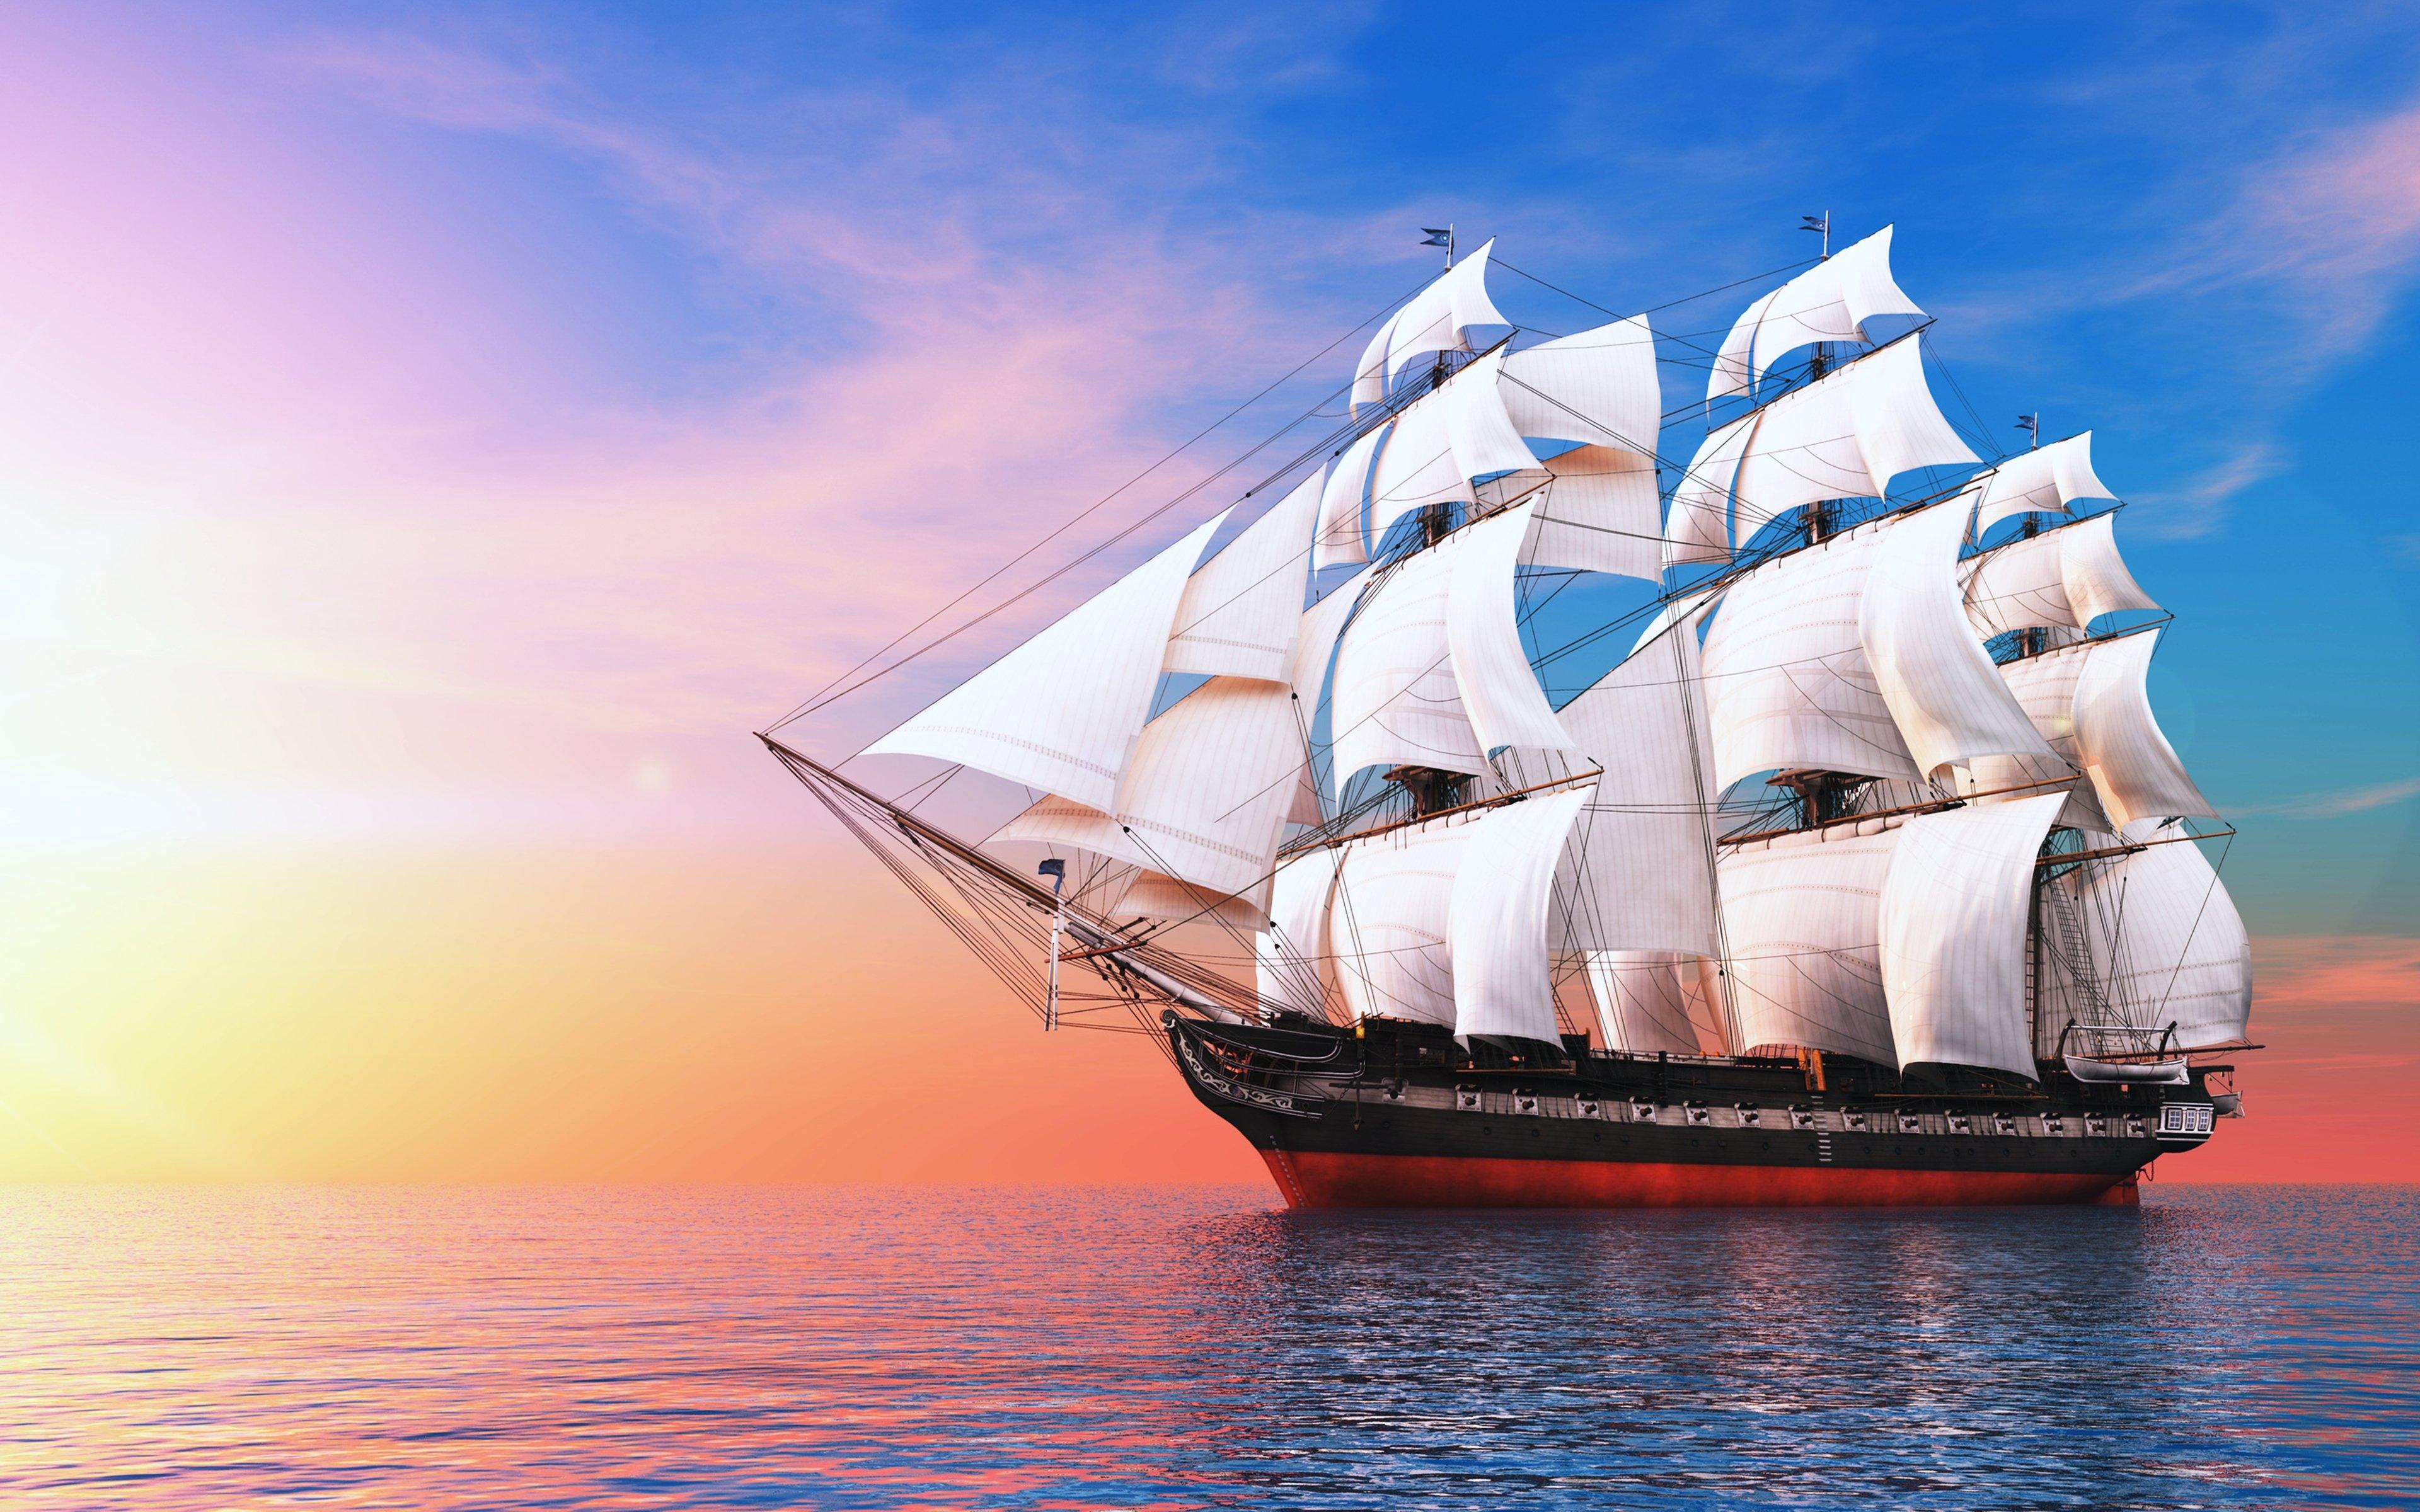 3840x2400 wallpaper ocean boat - photo #15